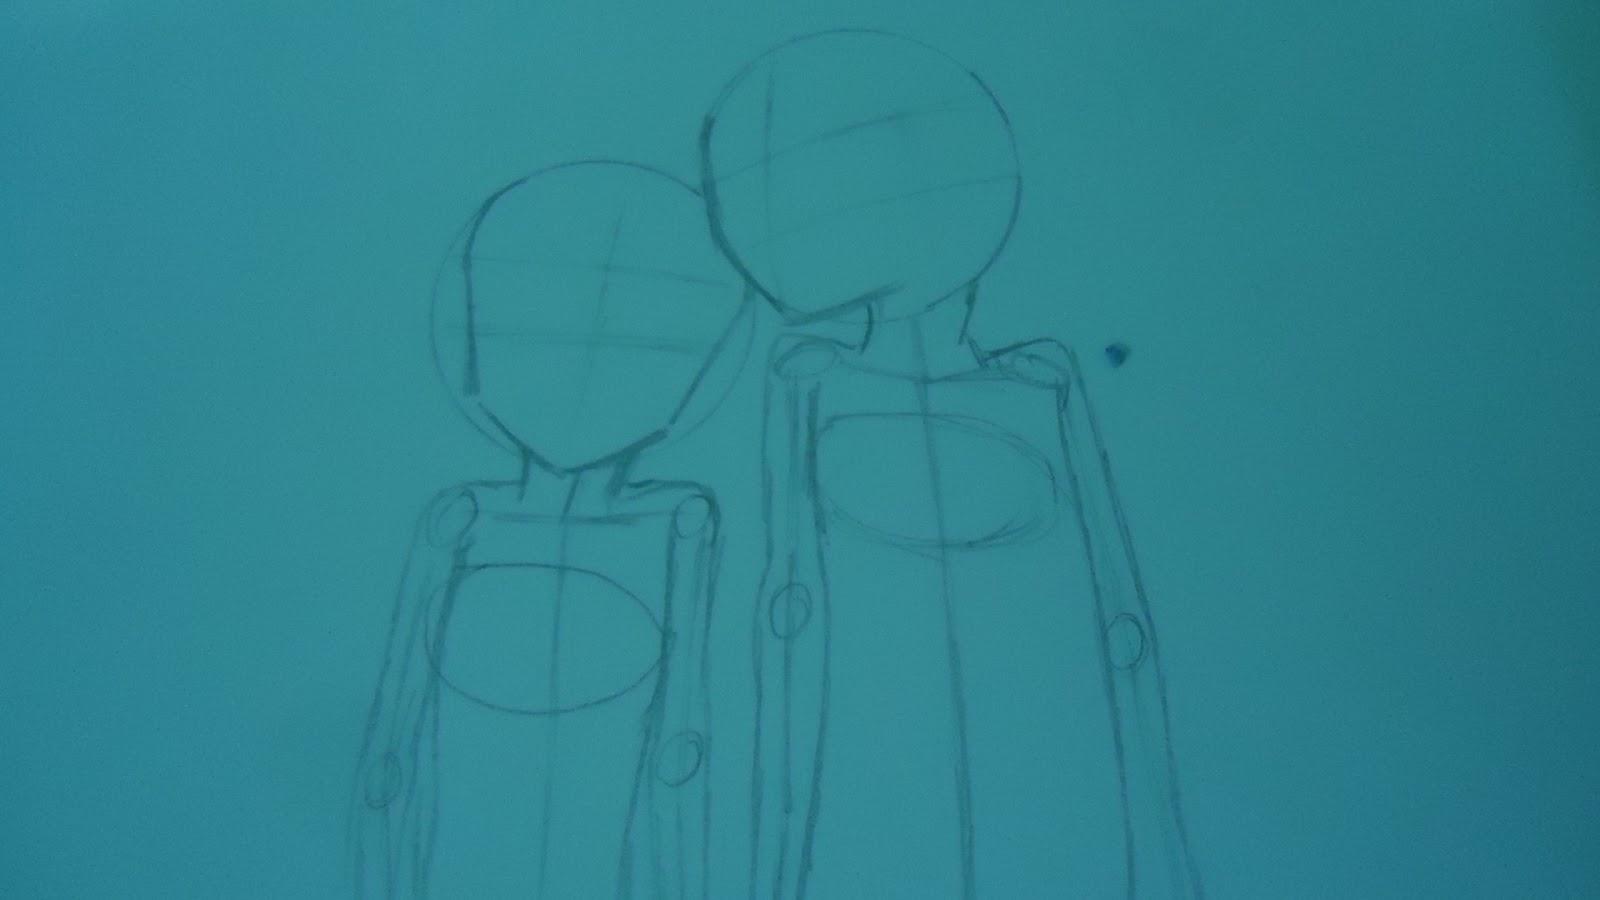 Semuanya ade 8 step untuk lukis anime senang je kalau korang lembutkankan tekanan pensel korang tuu bahan bahannyapencil mechanicallorekkan pensil